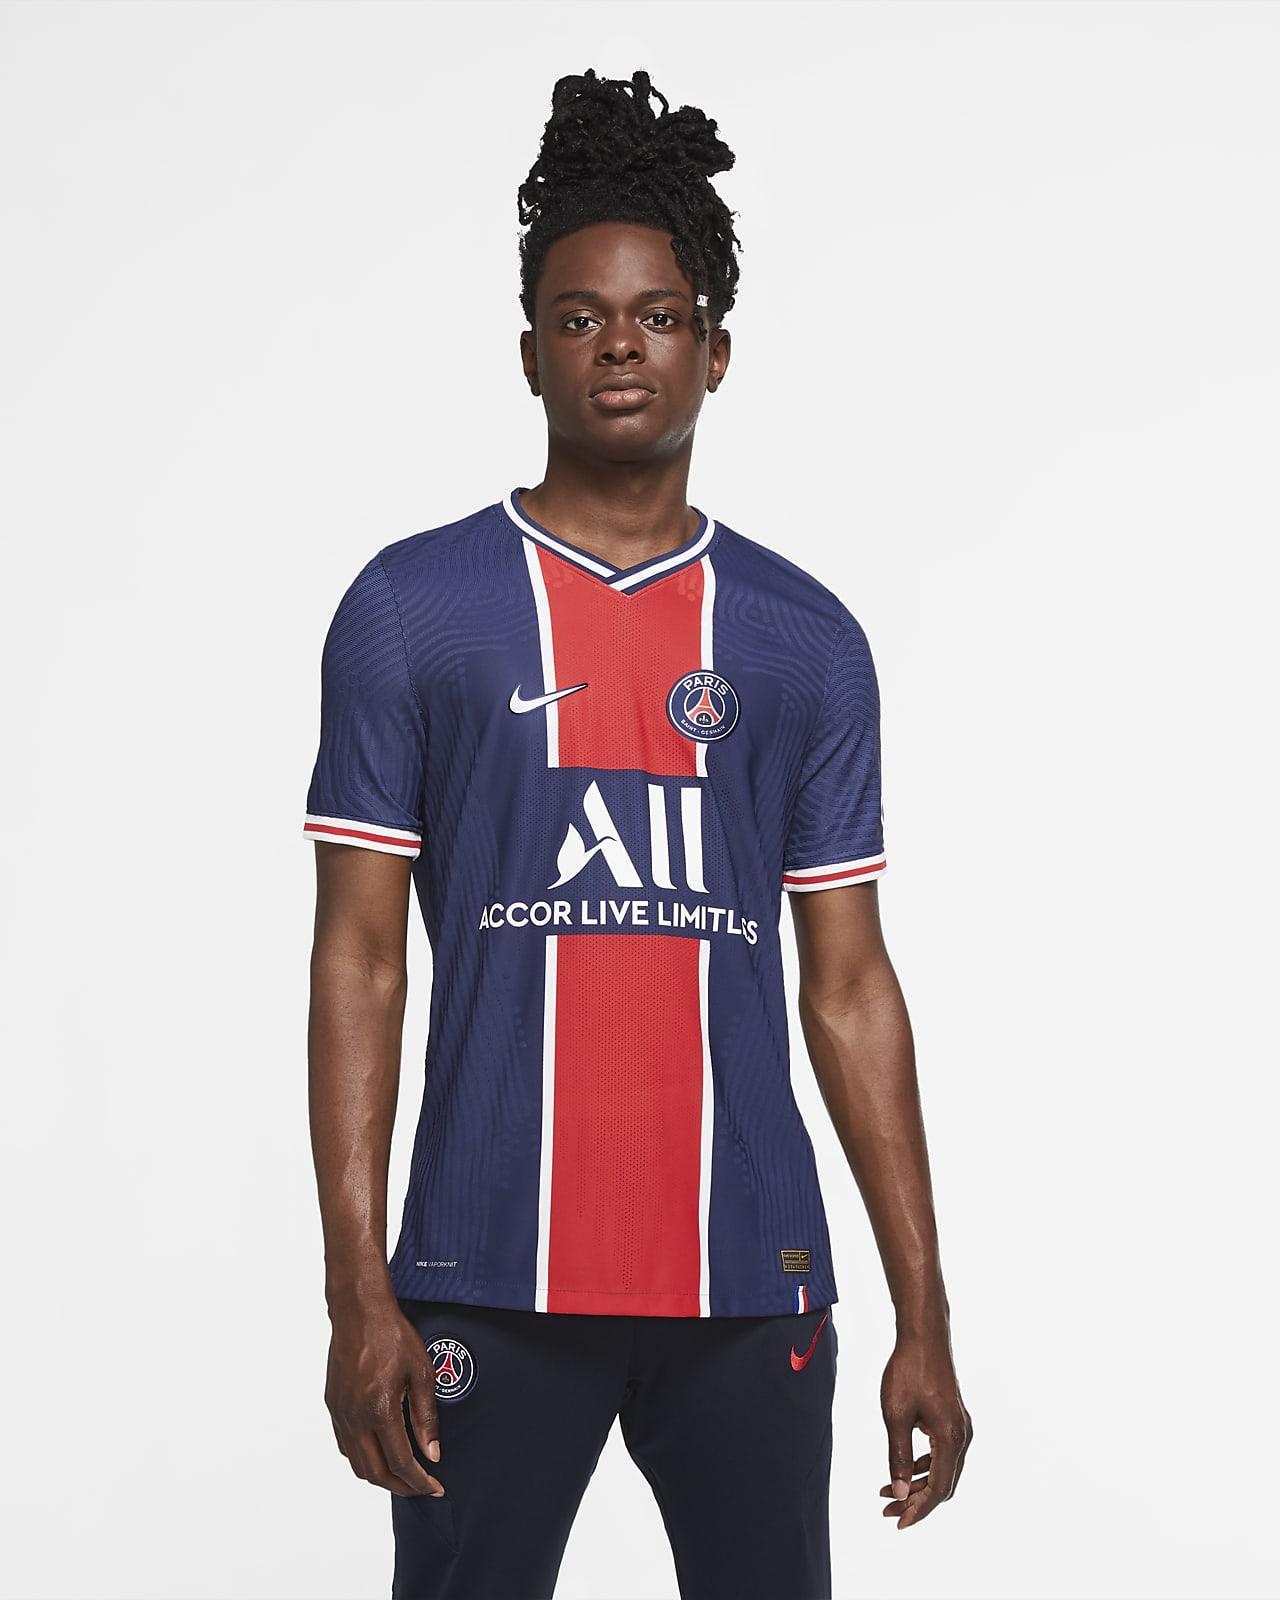 Camiseta de fútbol de local para hombre Vapor Match del Paris Saint-Germain 2020/21